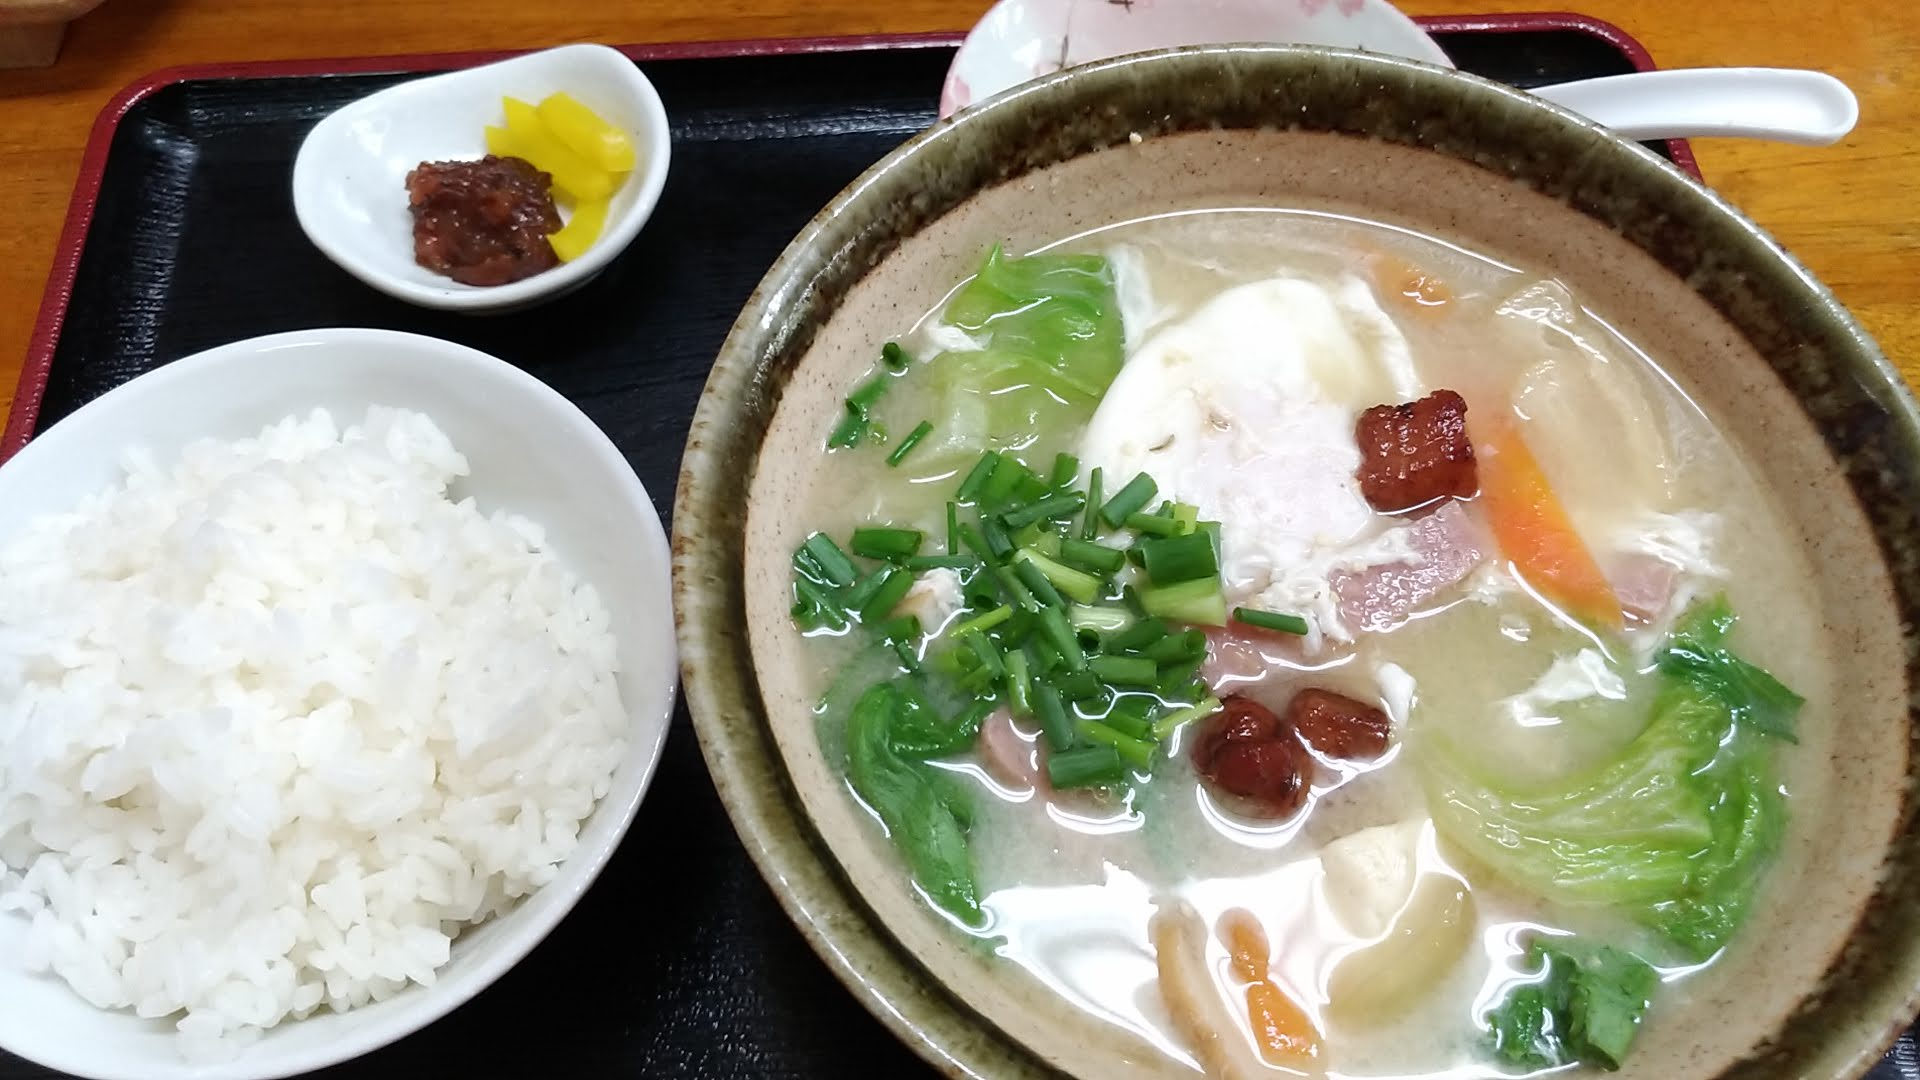 the miso soup of Mi-yaguwa